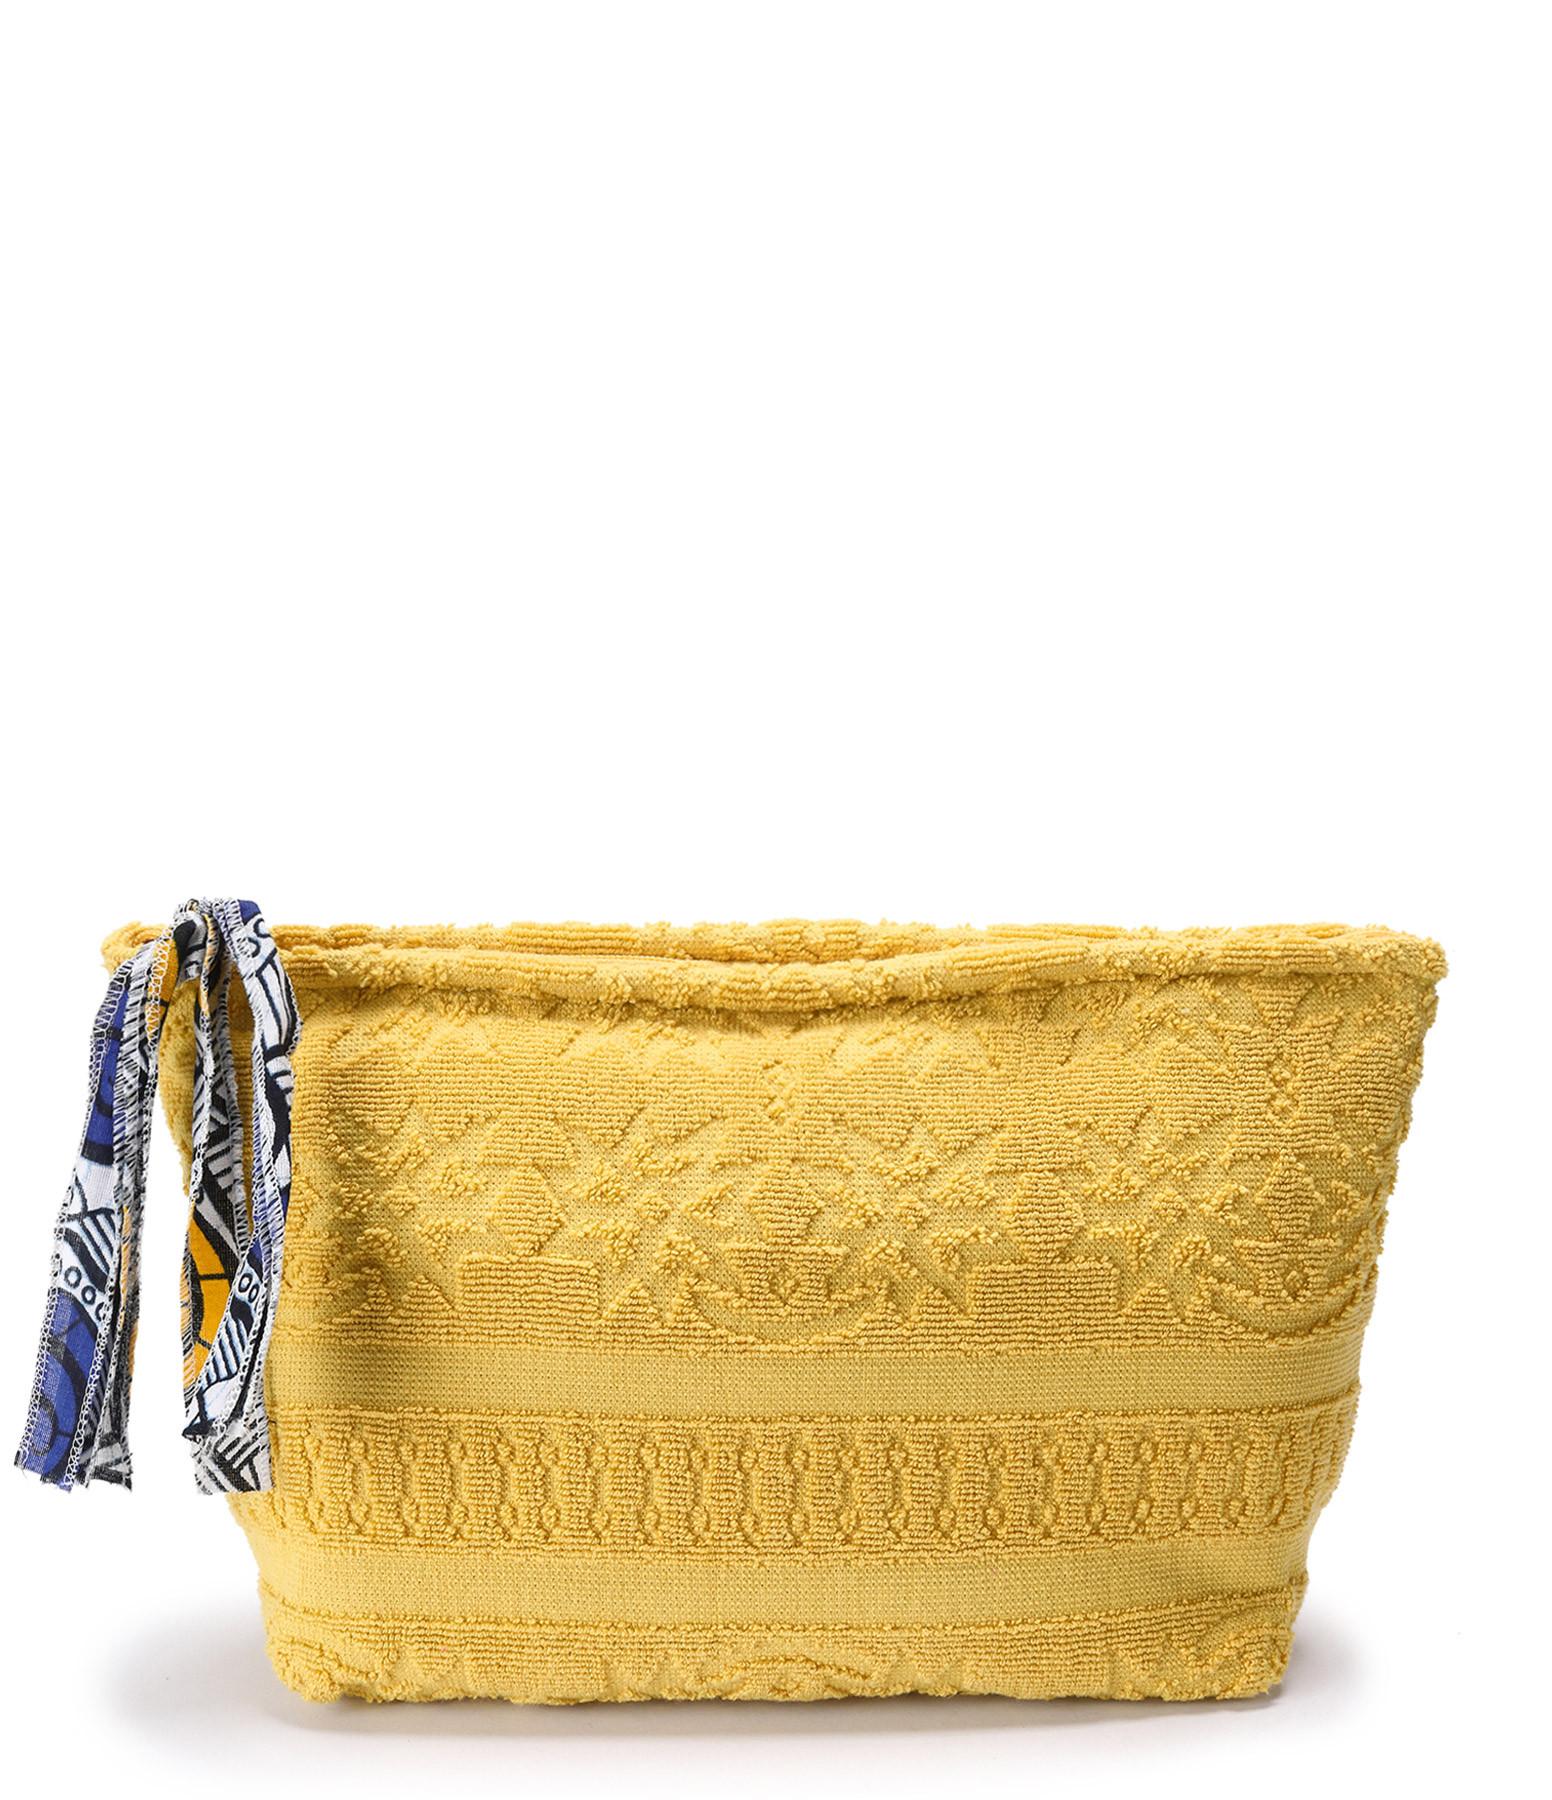 LALLA - Trousse XL Walakin Eponge Banane